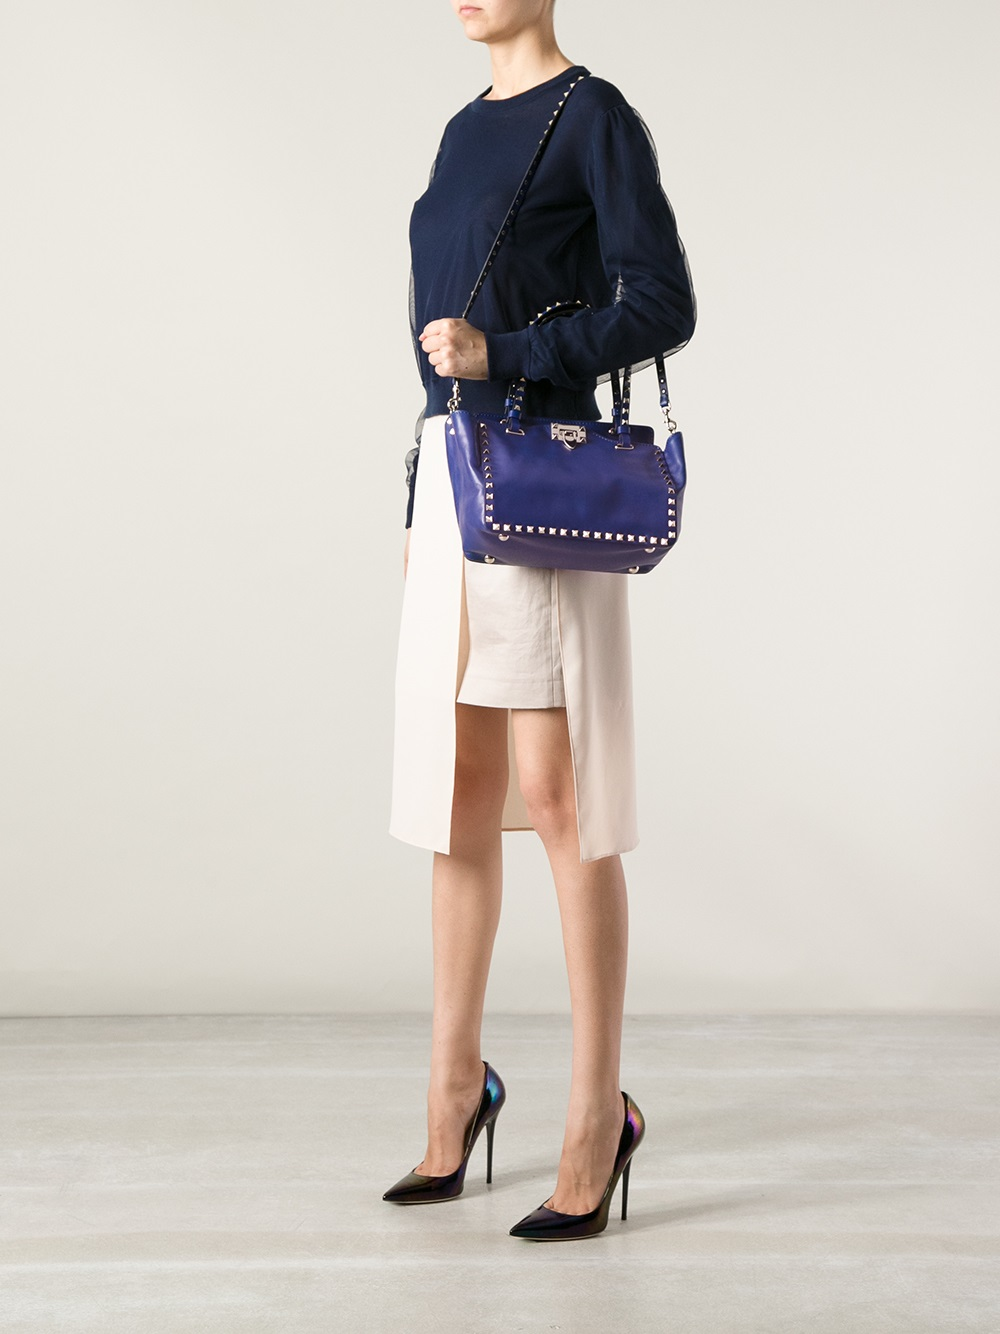 Valentino Rockstud Tote Bag In Blue Lyst